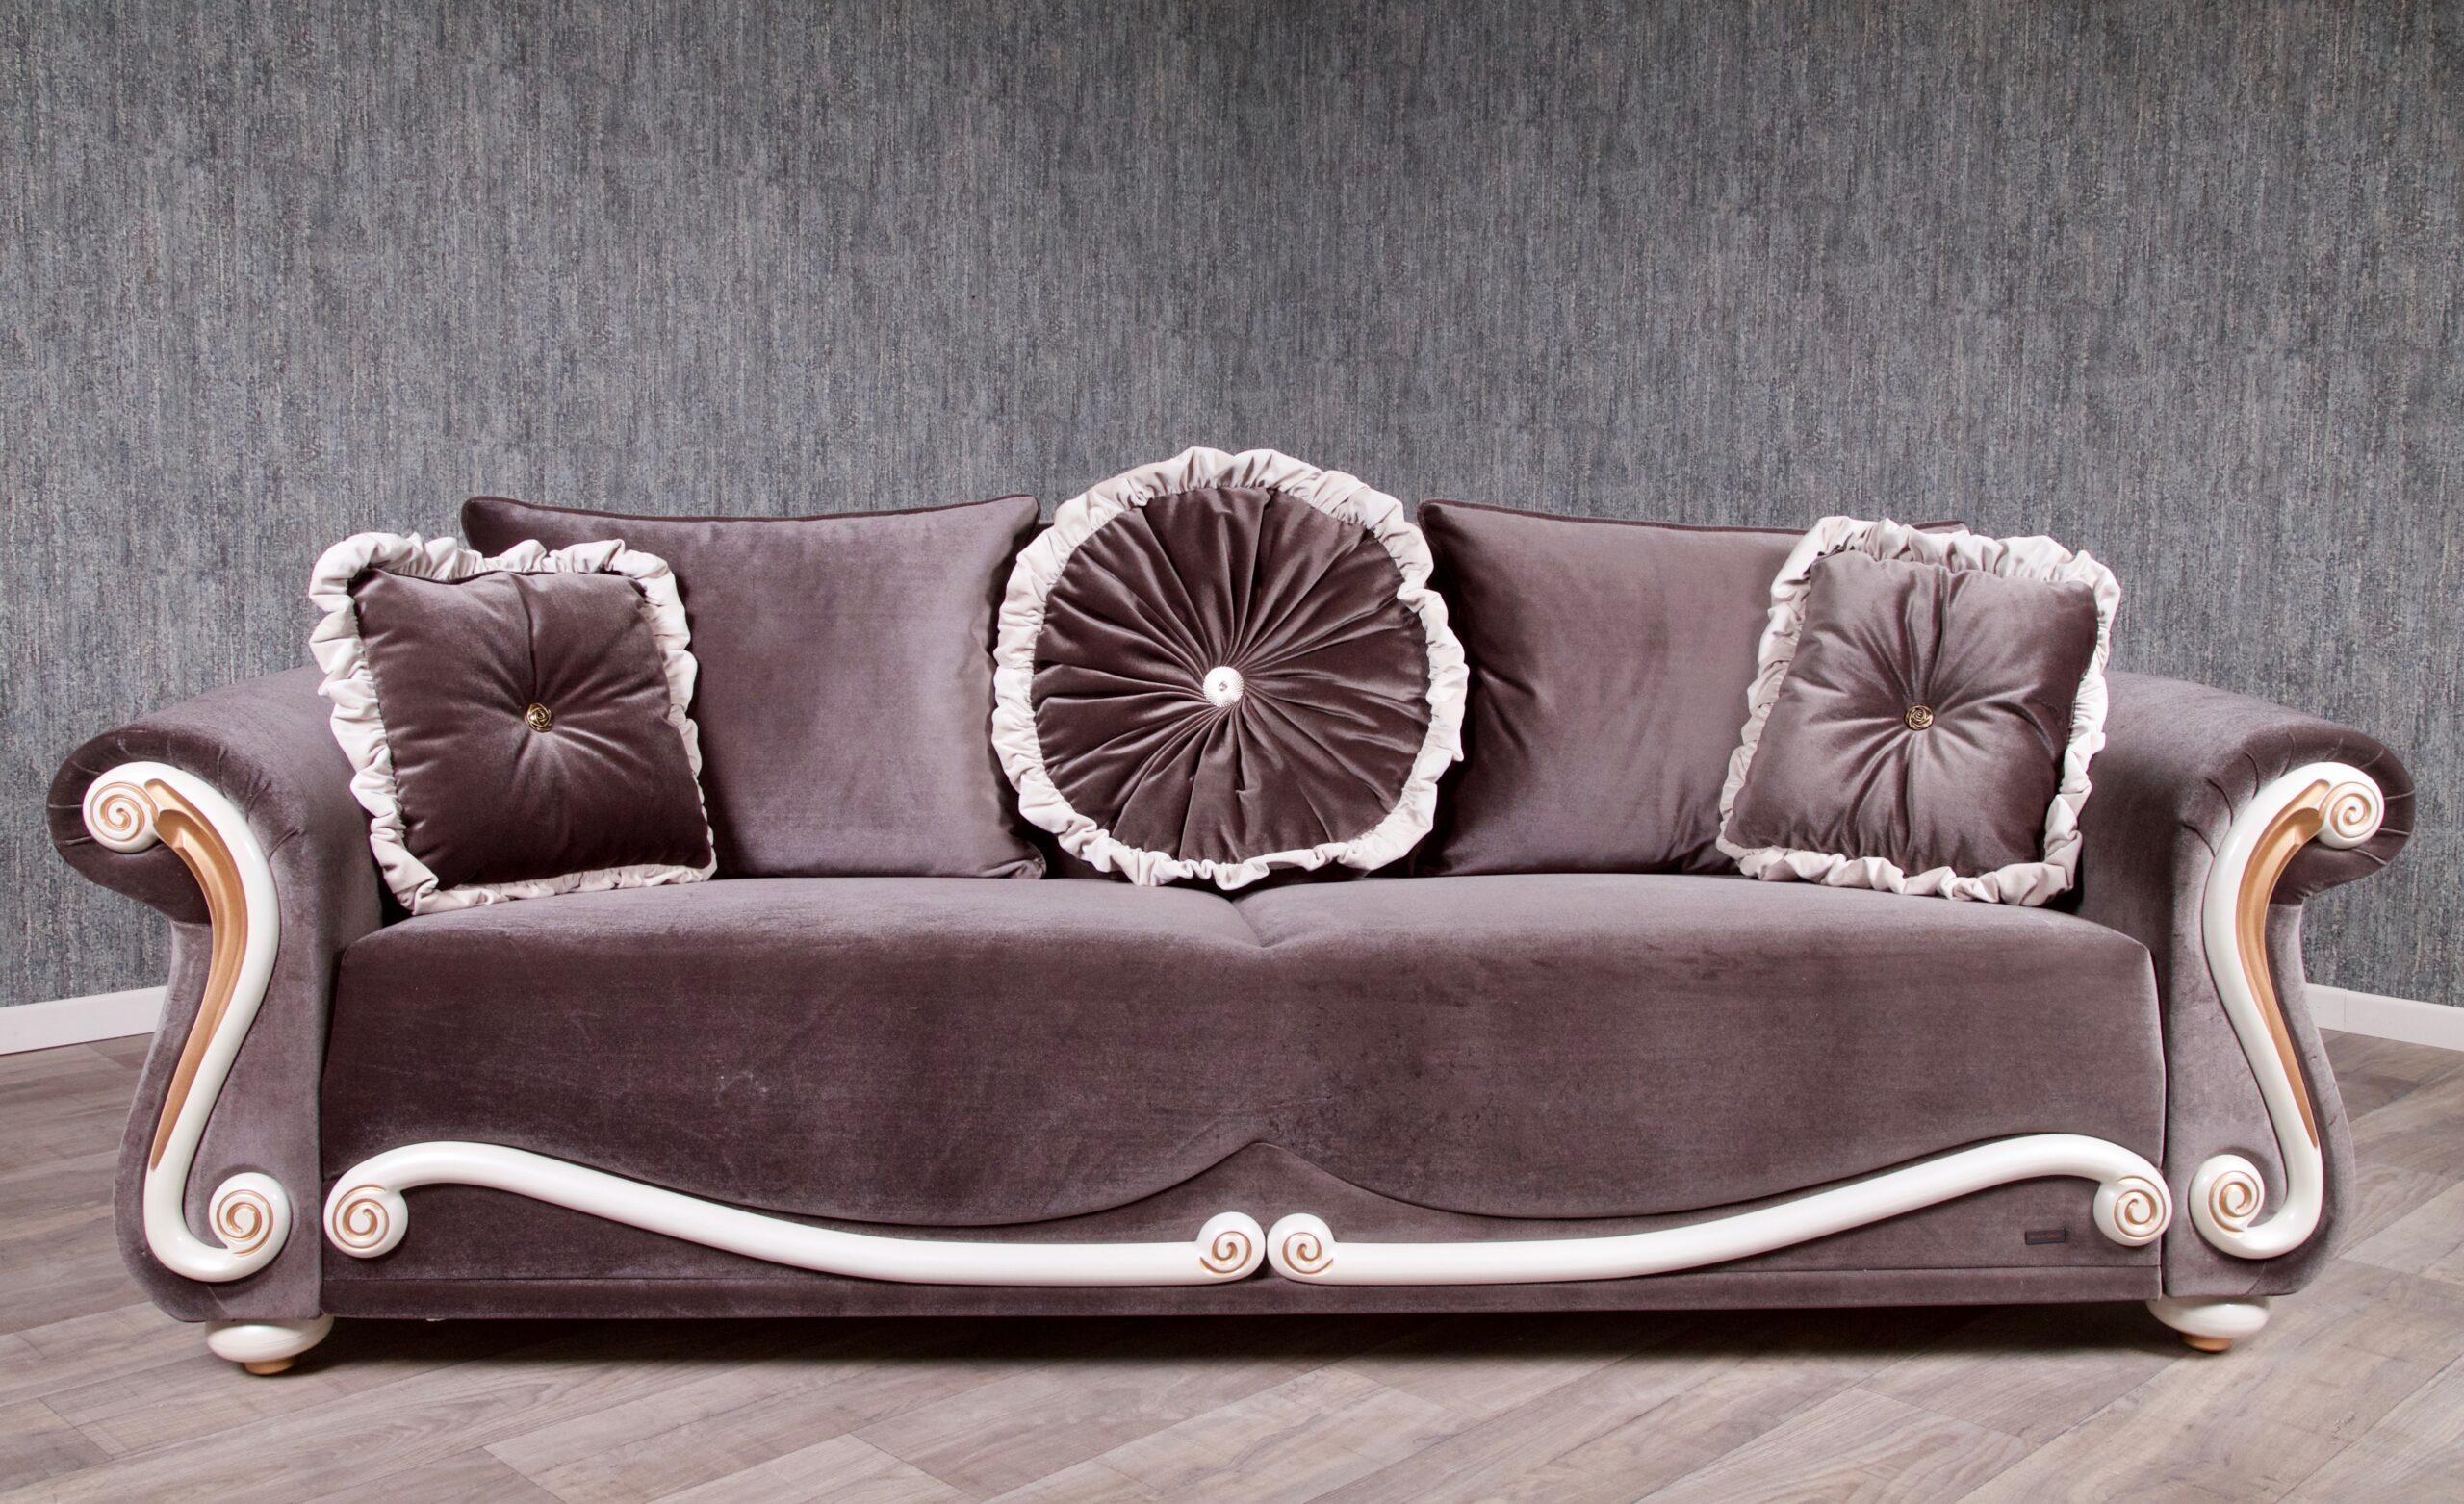 Full Size of Sofa Antik Sofas Kaufen Gebraucht Leder Look Couch Antiklederoptik Stil Ledersofa Braun Bali Murah Barock Chesterfield In Anthrazit Einzelstcke Restposten Sofa Sofa Antik